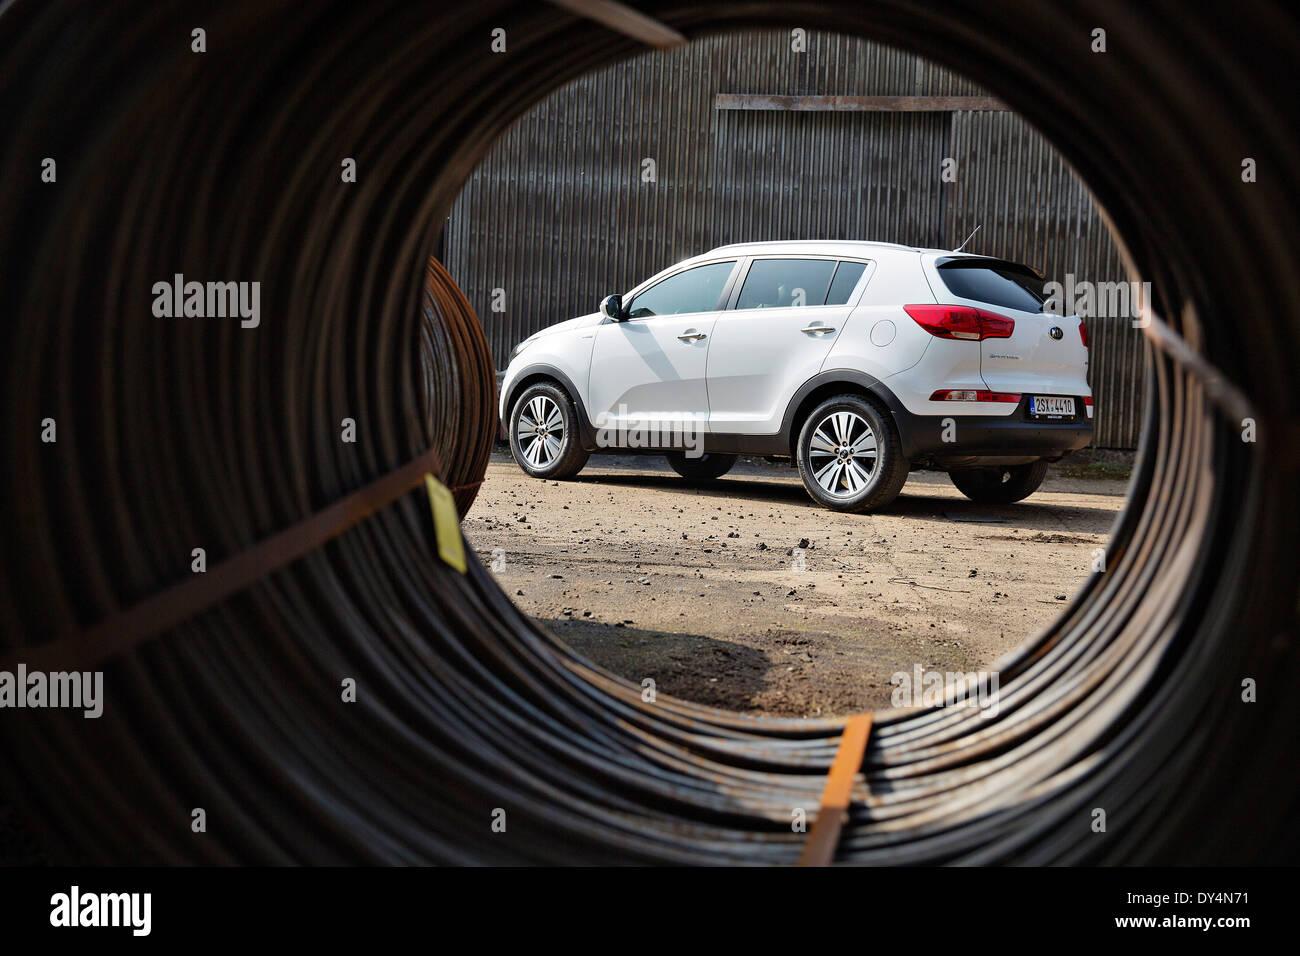 Kia Sportage, crossover, second generation - Stock Image